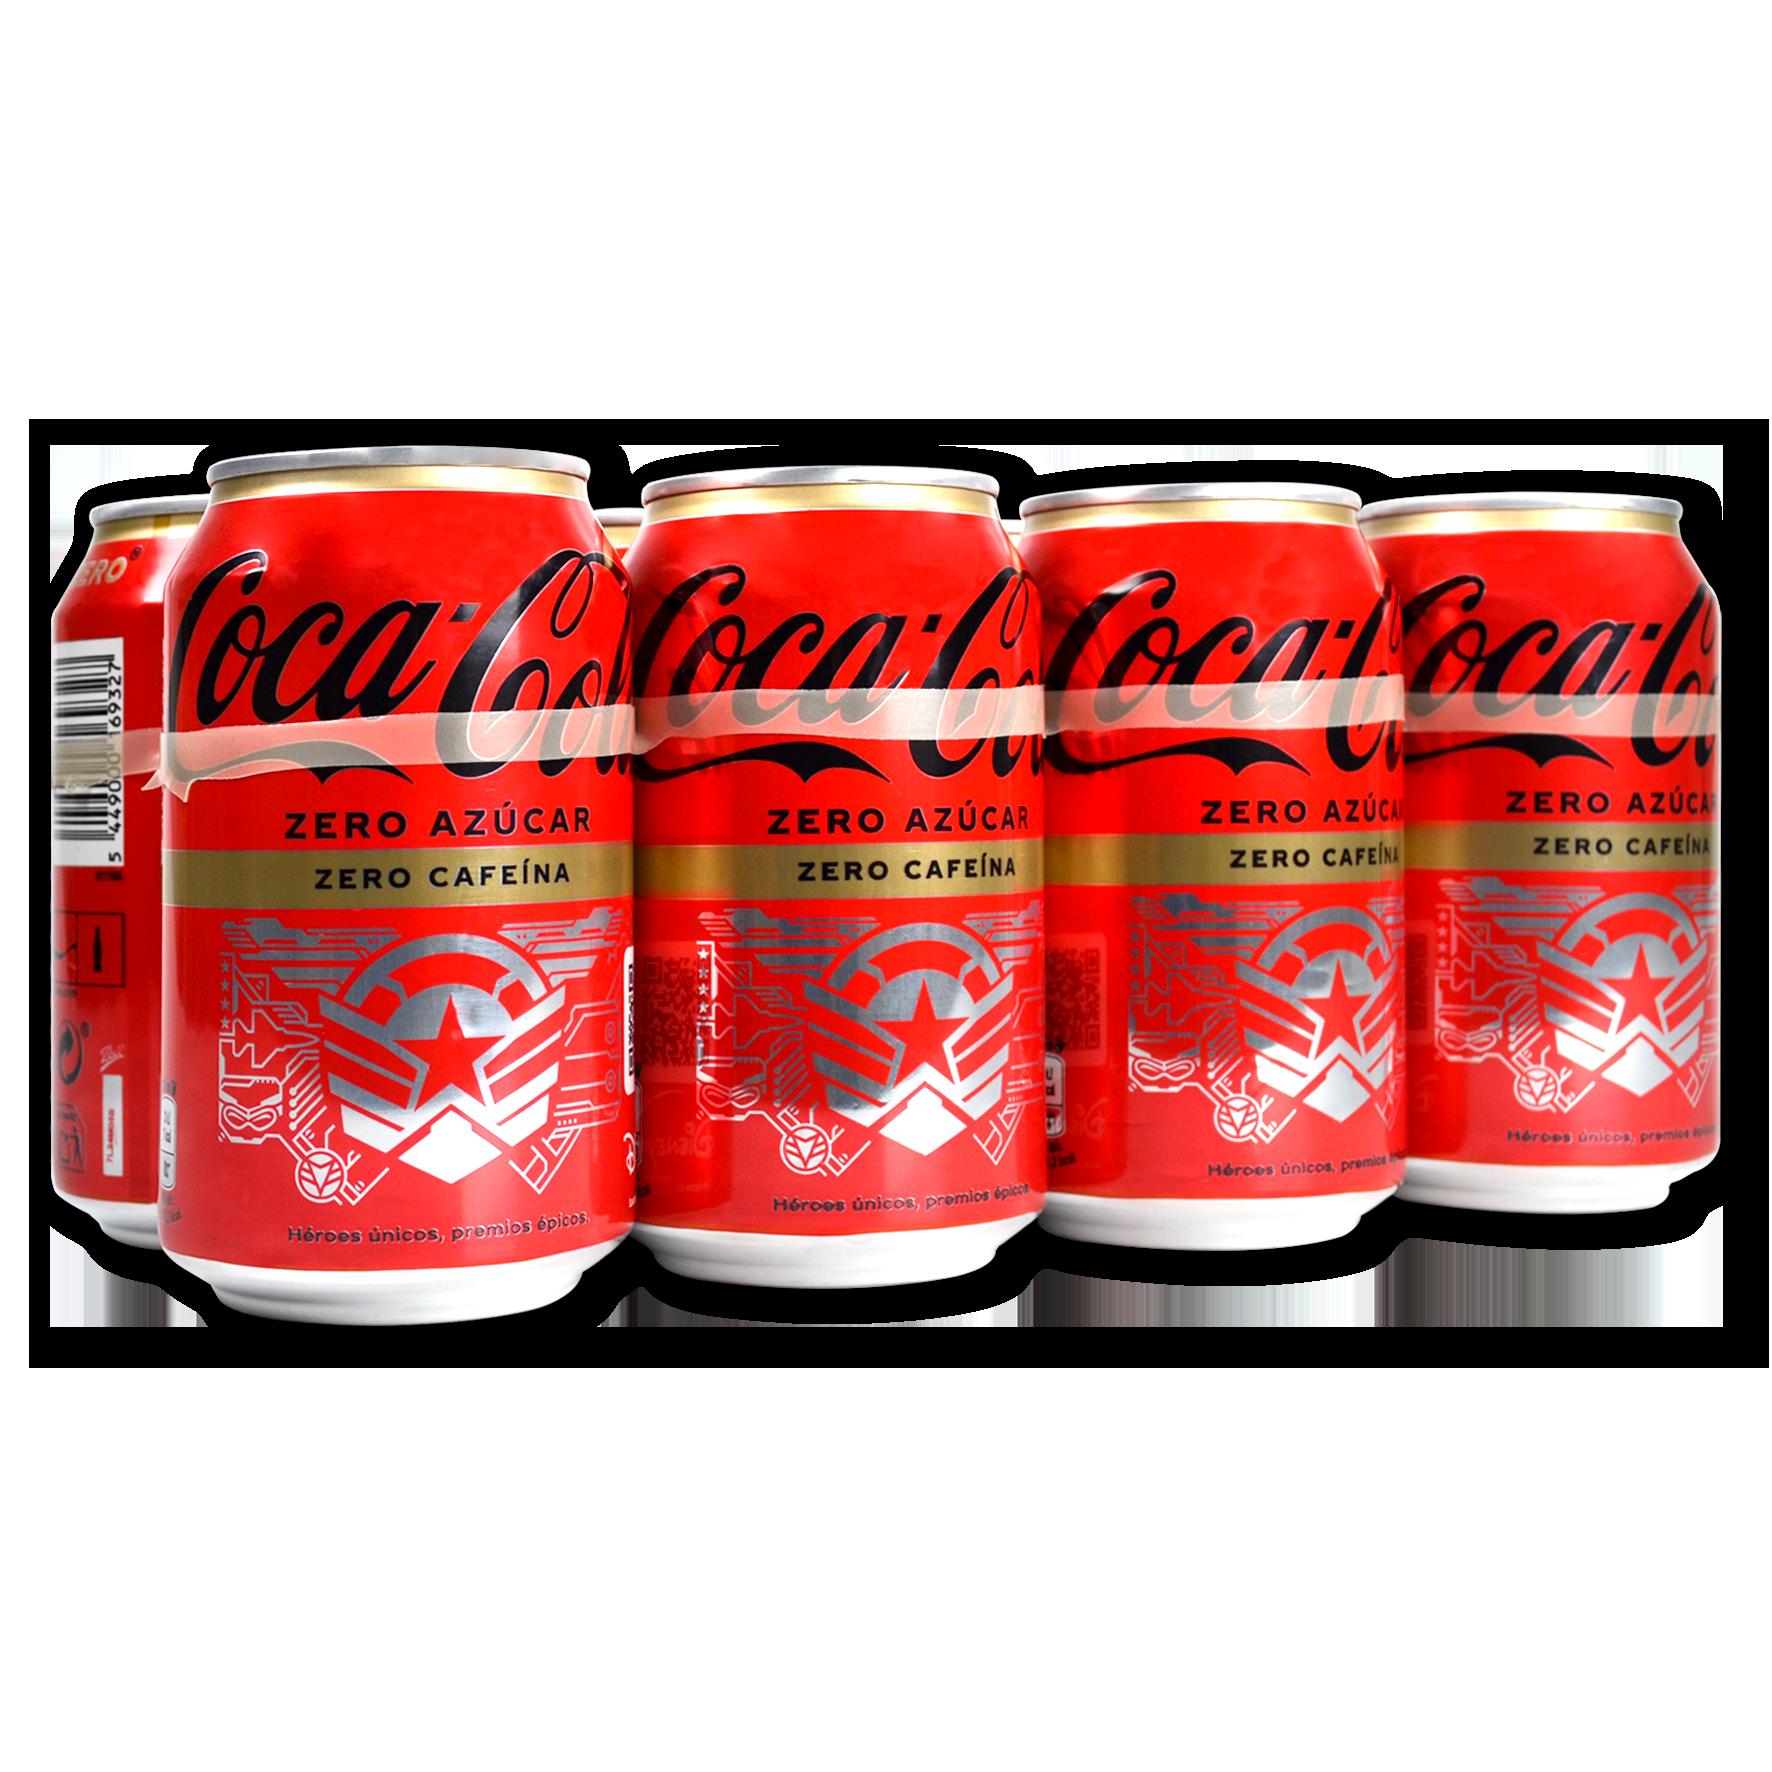 Coca Cola Zero sense cafeïna paq. de 8 llaunes